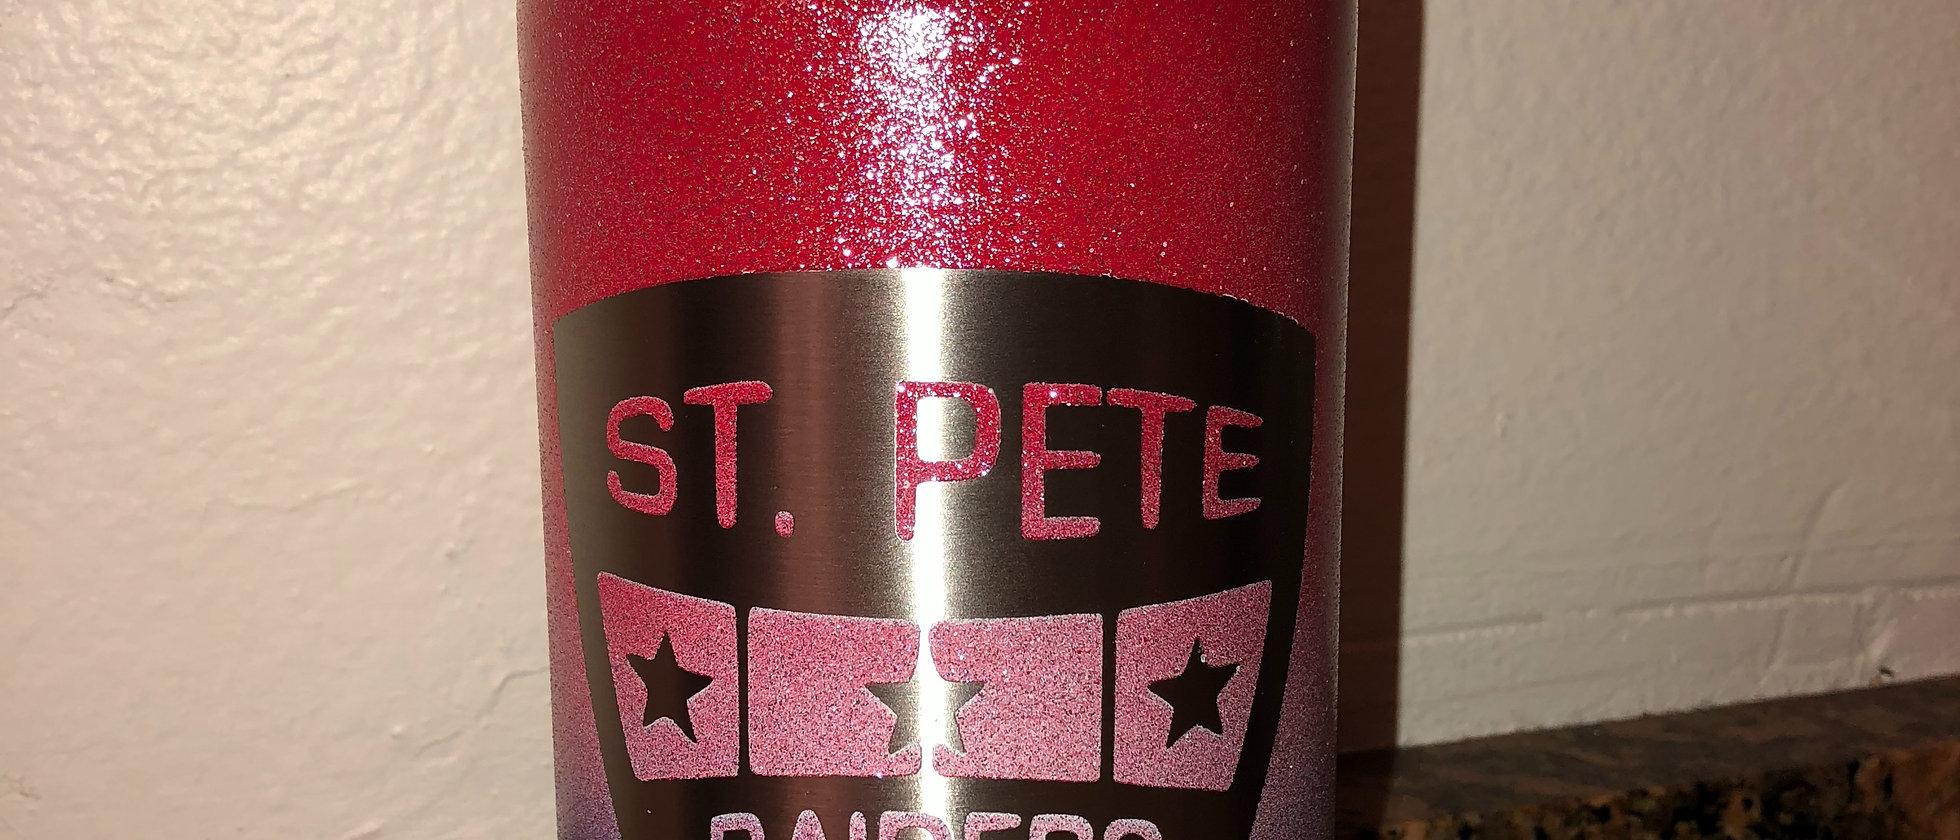 St Pete Raiders water bottle